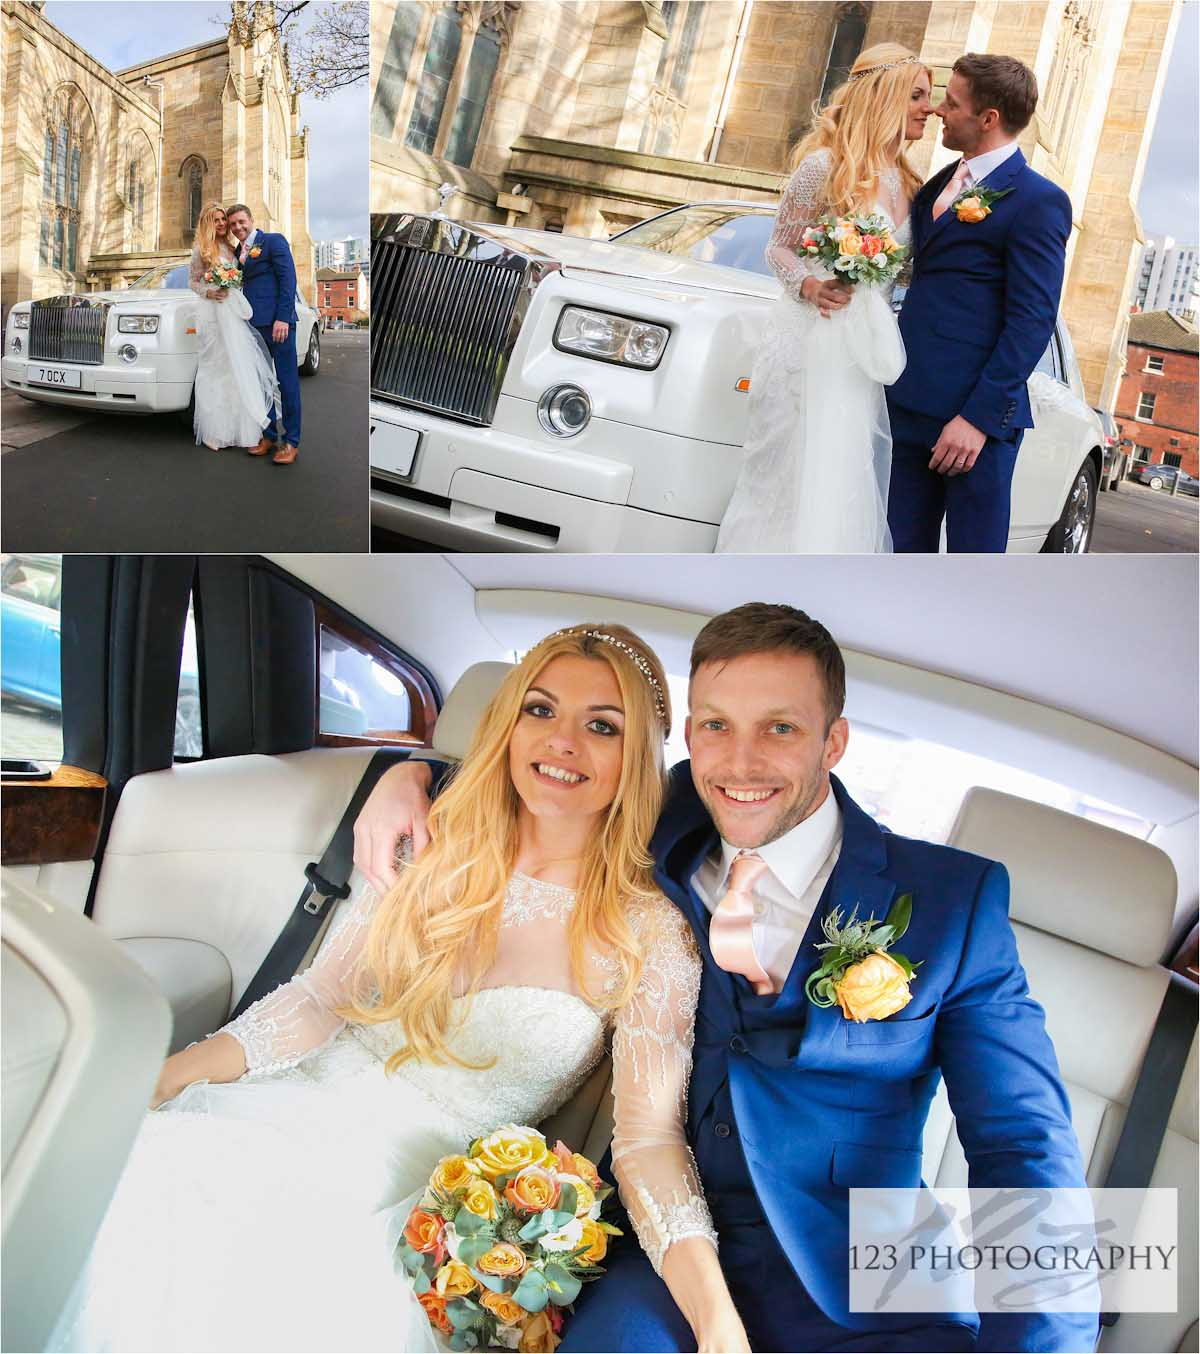 Leeds Minster wedding